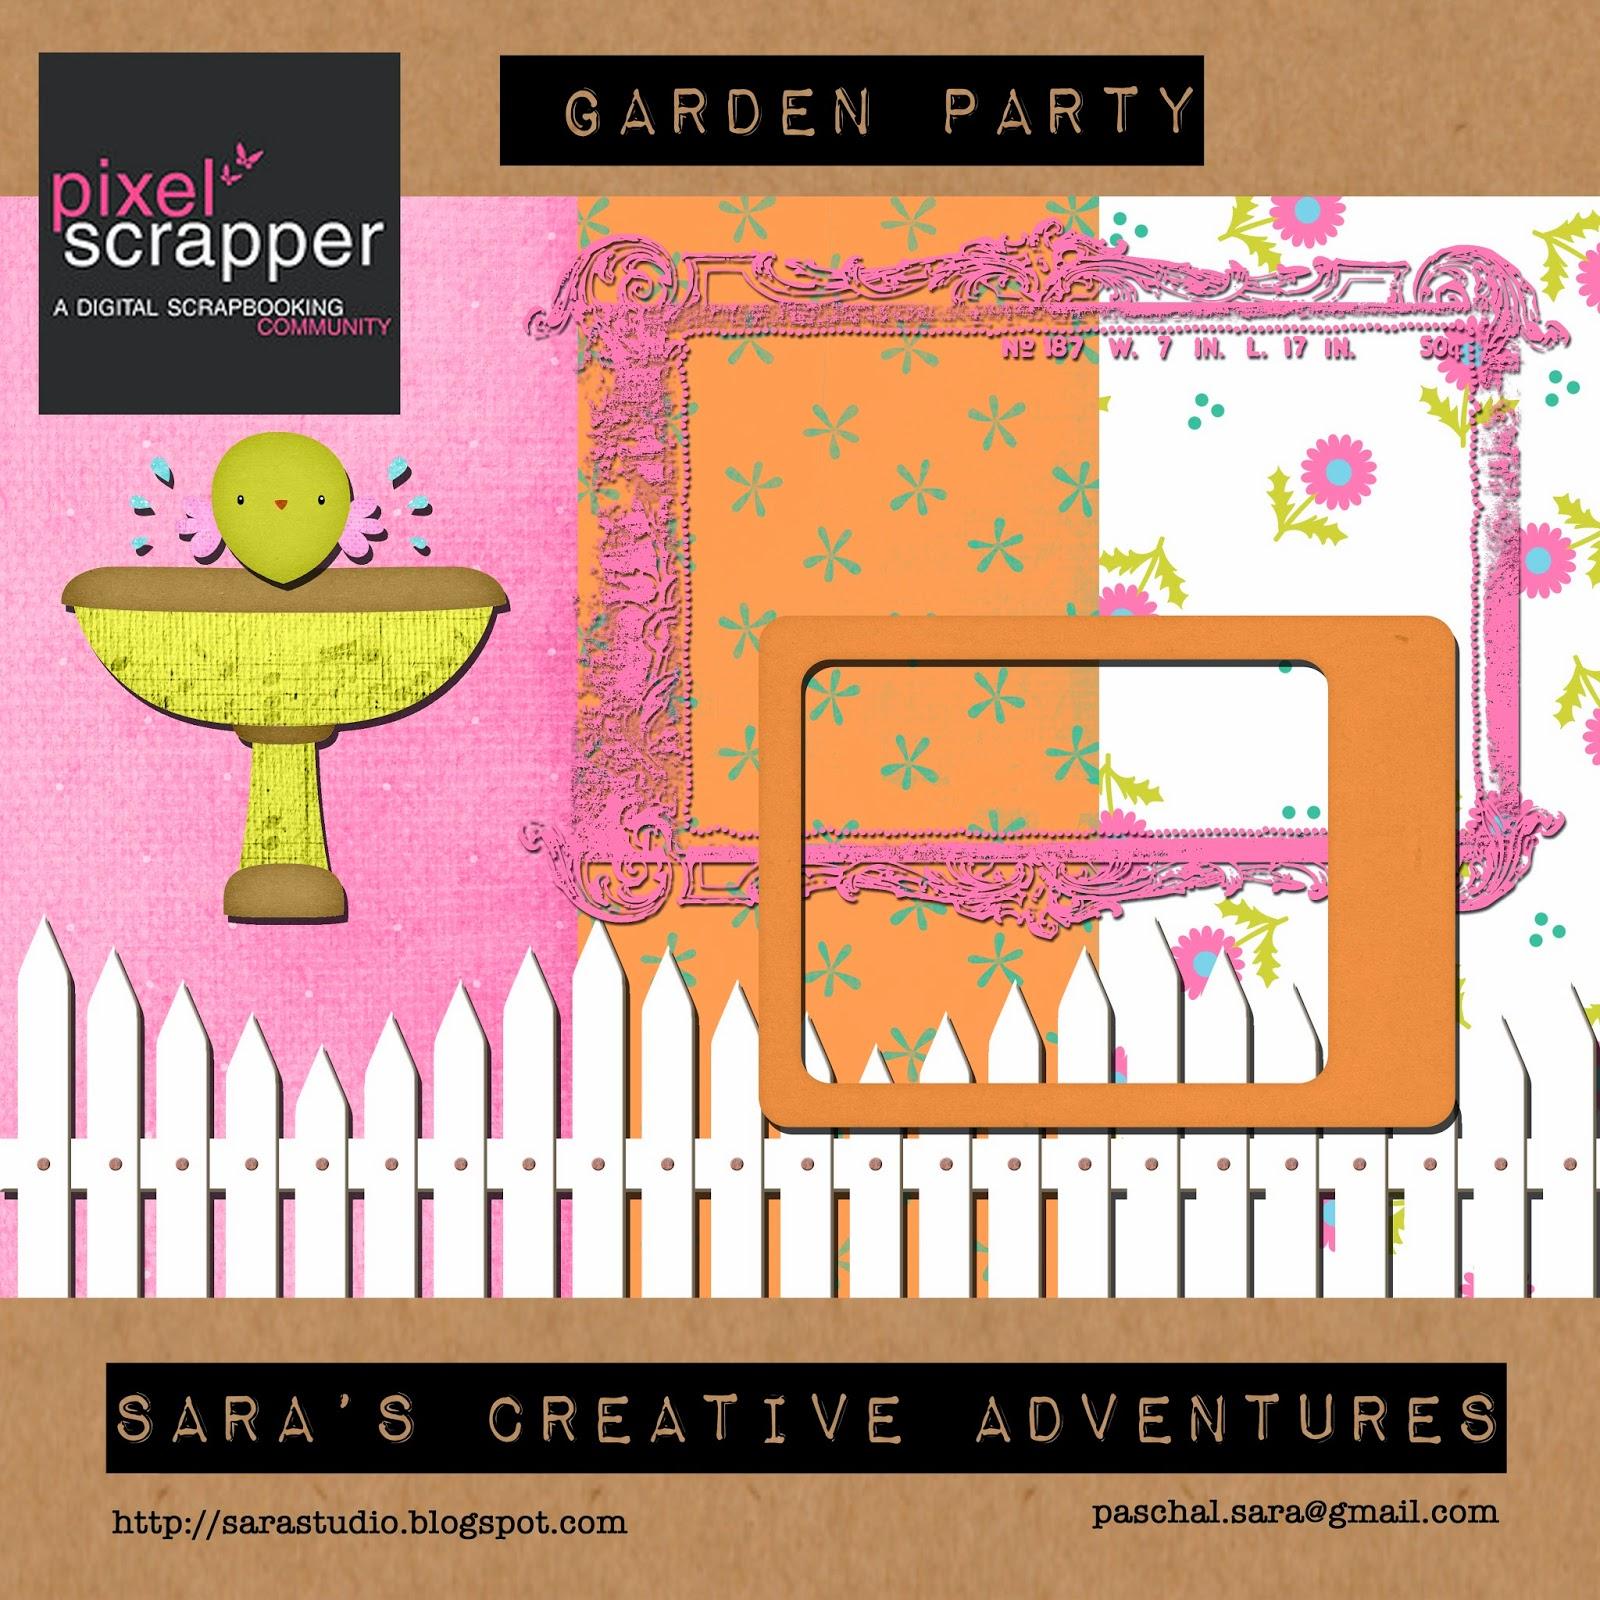 http://1.bp.blogspot.com/-VHKzMBdBp_s/U9GQjCo8NCI/AAAAAAAANN0/lBOvBhYoyrk/s1600/Garden+Party.jpg